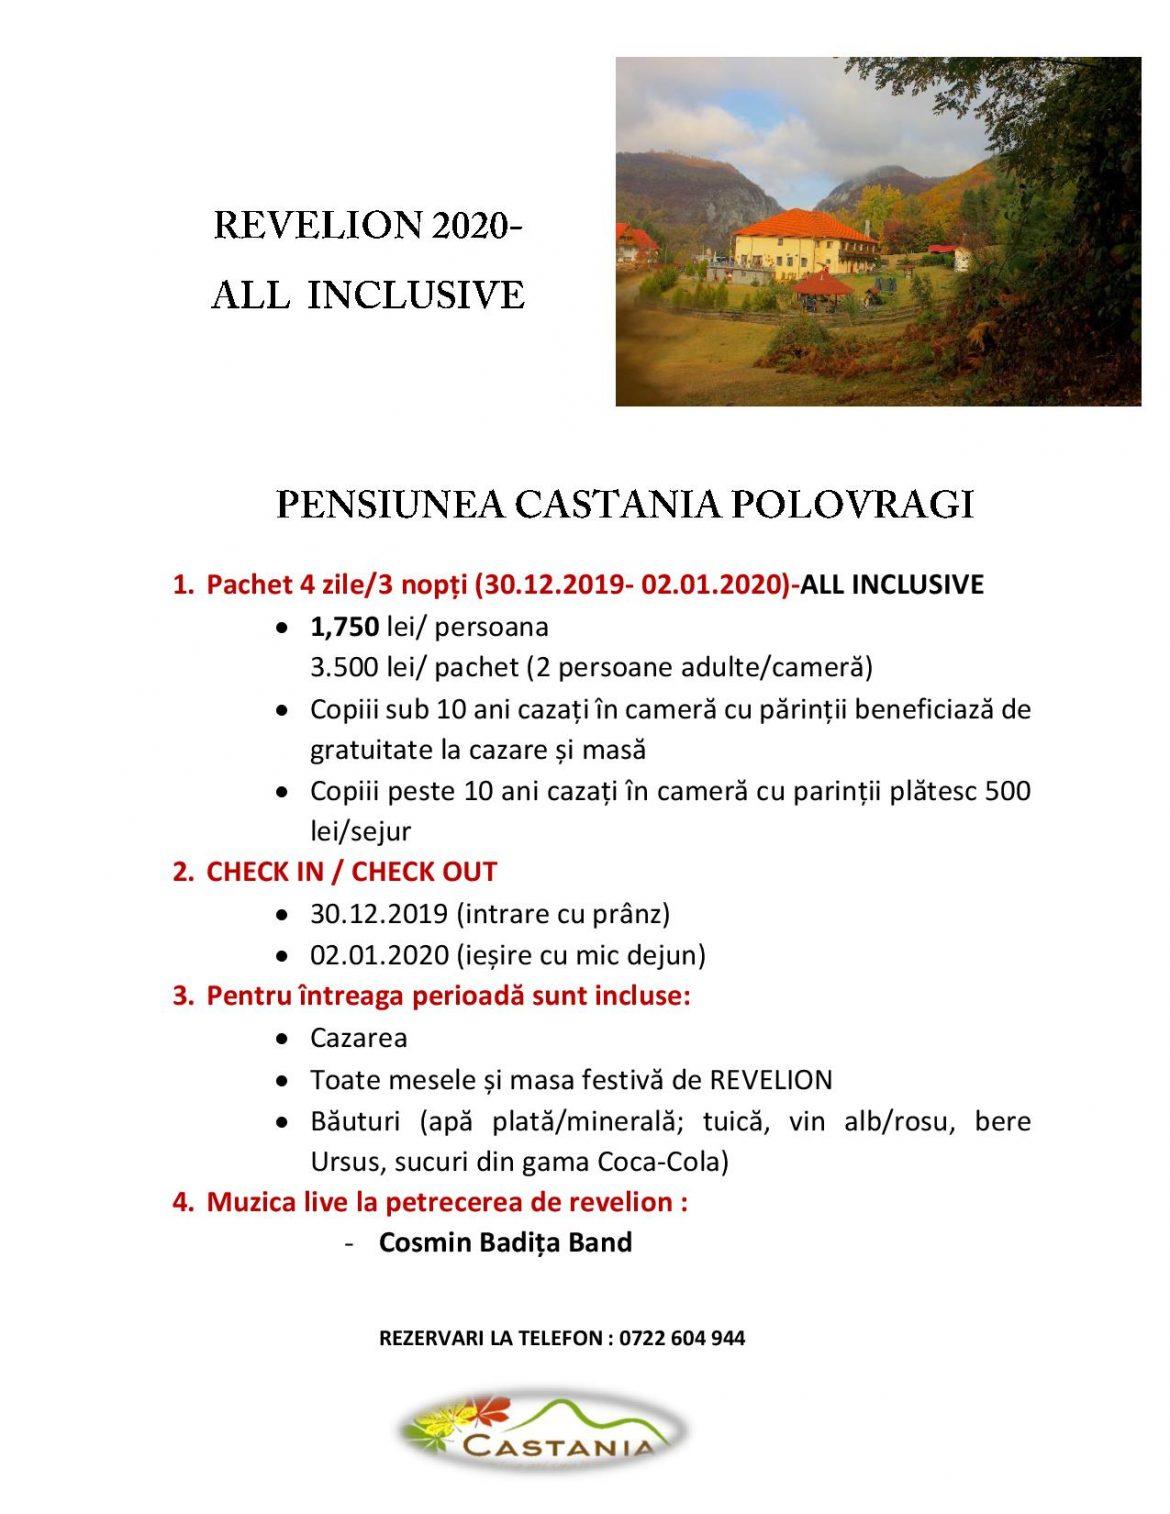 Revelion-Castania-new-page-001.jpg